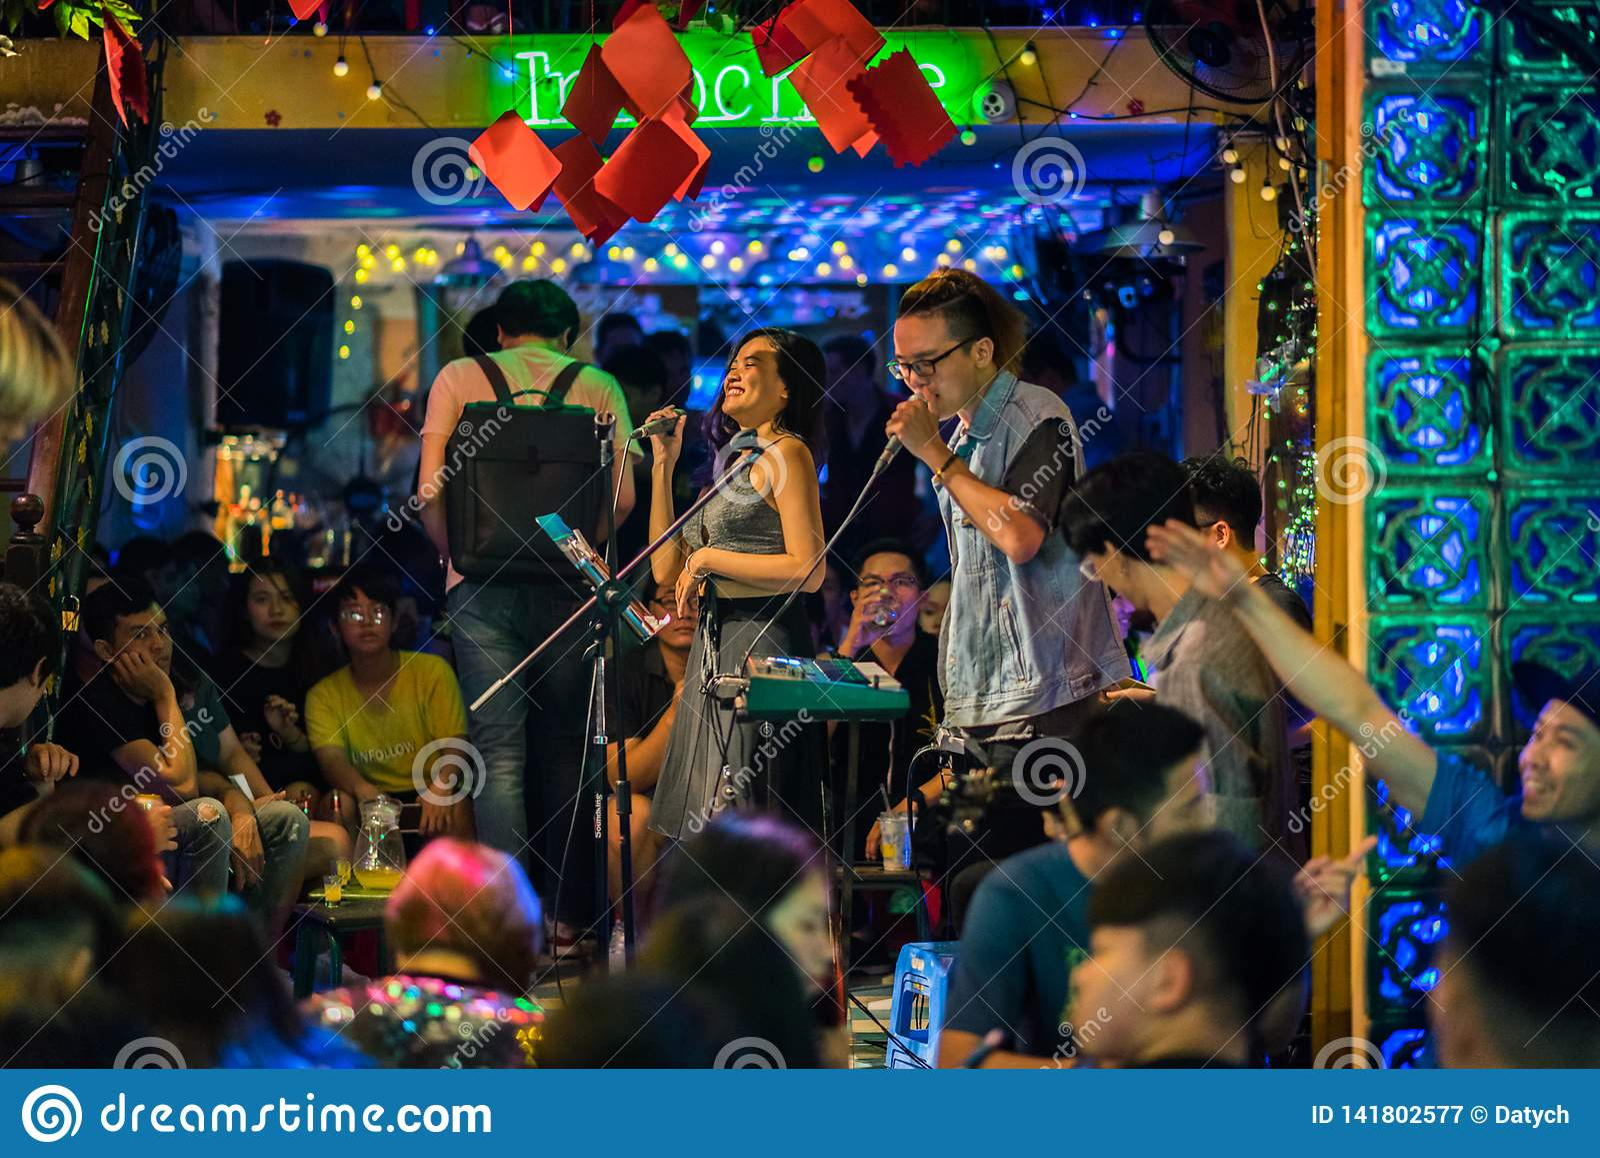 Ho Chi Minh City Saigon Vietnam Nightlife In Bui Vien Street Editorial Photography Image Of Editorial Interior 141802577